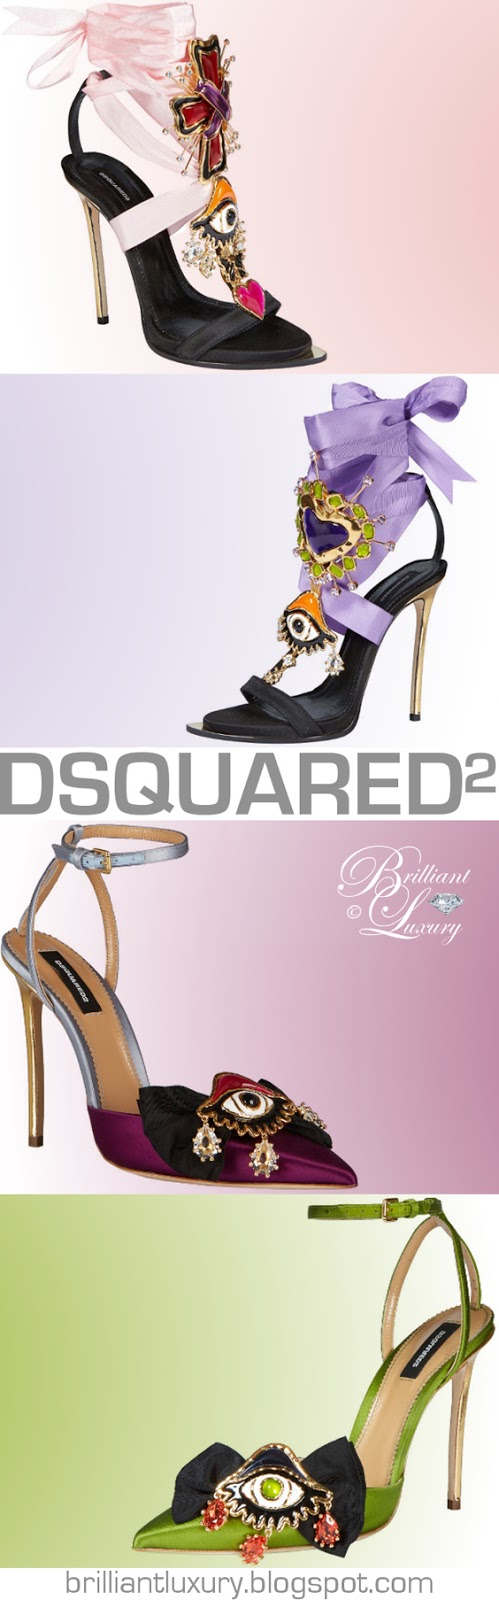 Brilliant Luxury ♦ Dsquared2 fabulous heels